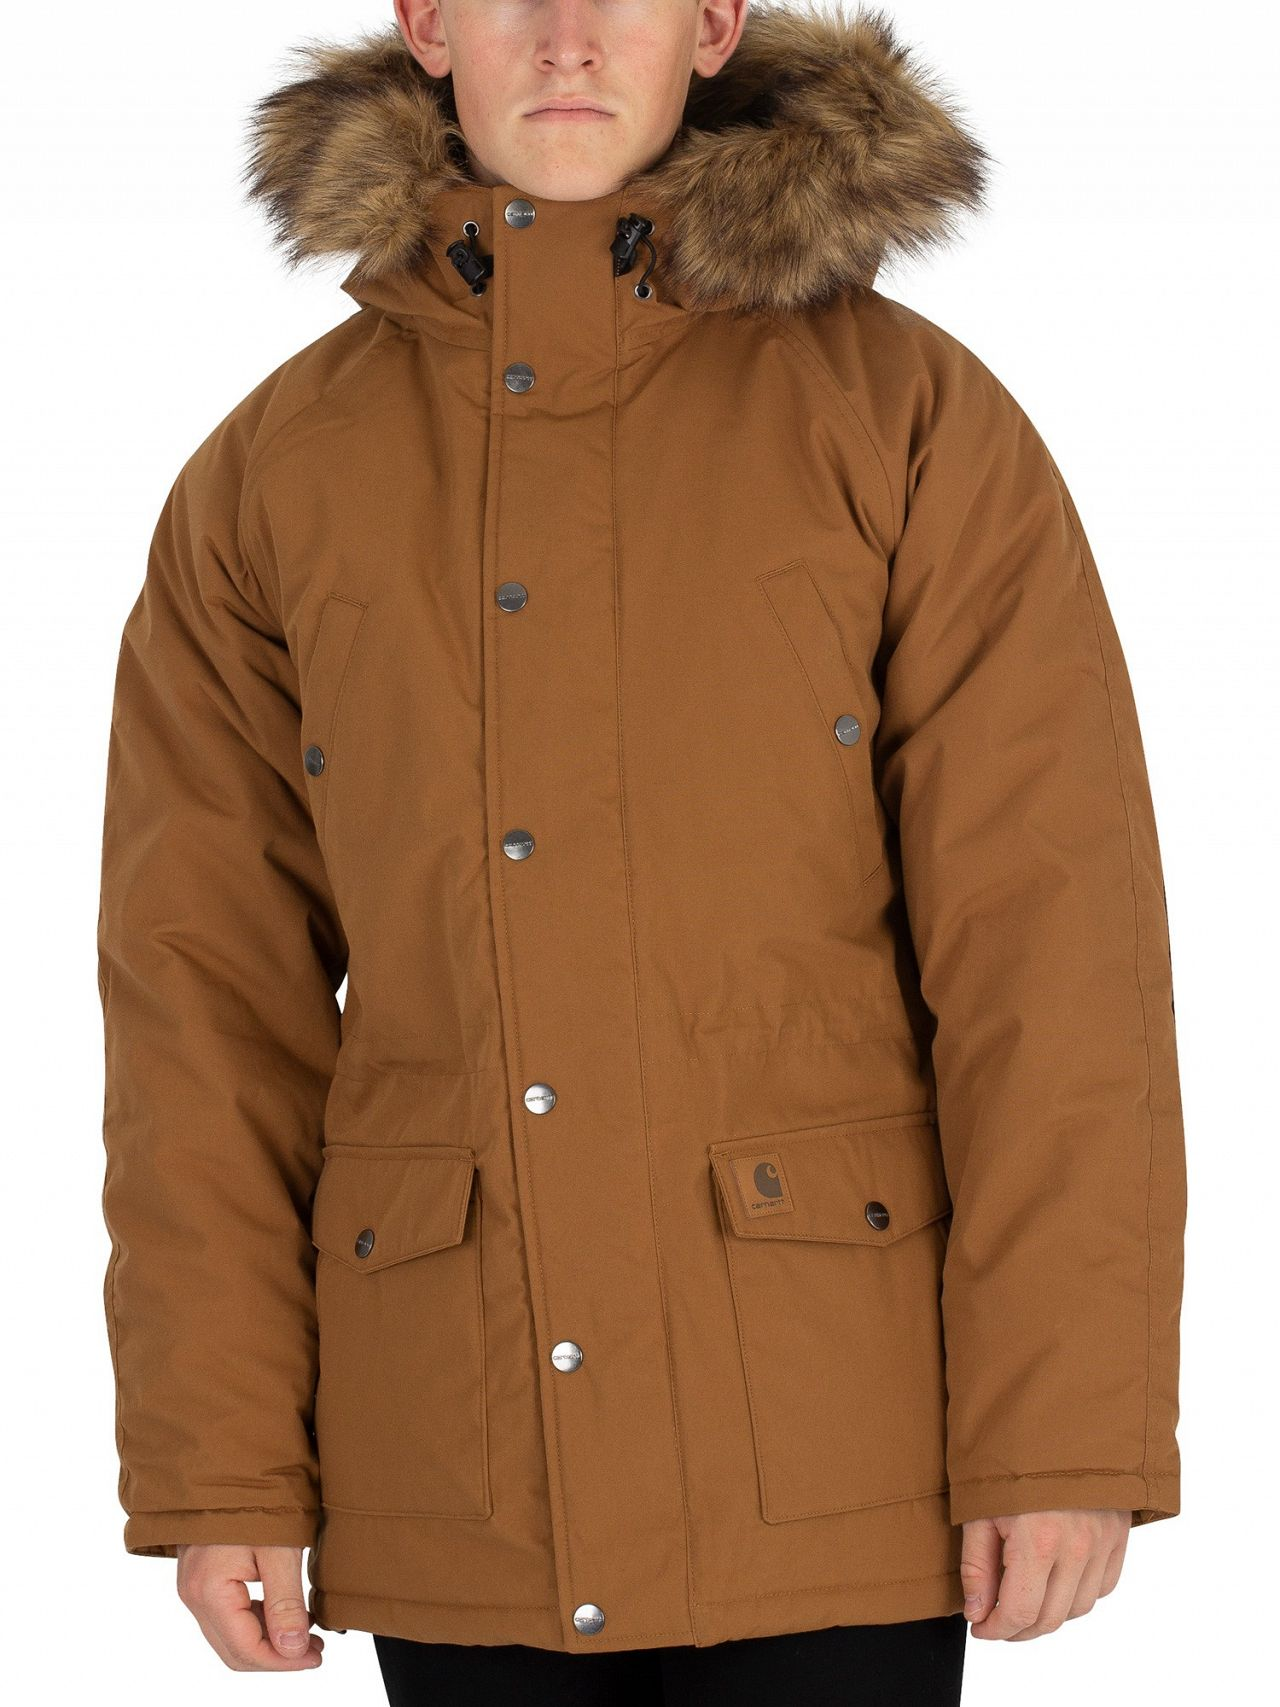 a5517750e Carhartt WIP Hamilton Brown/Black Trapper Parka Jacket